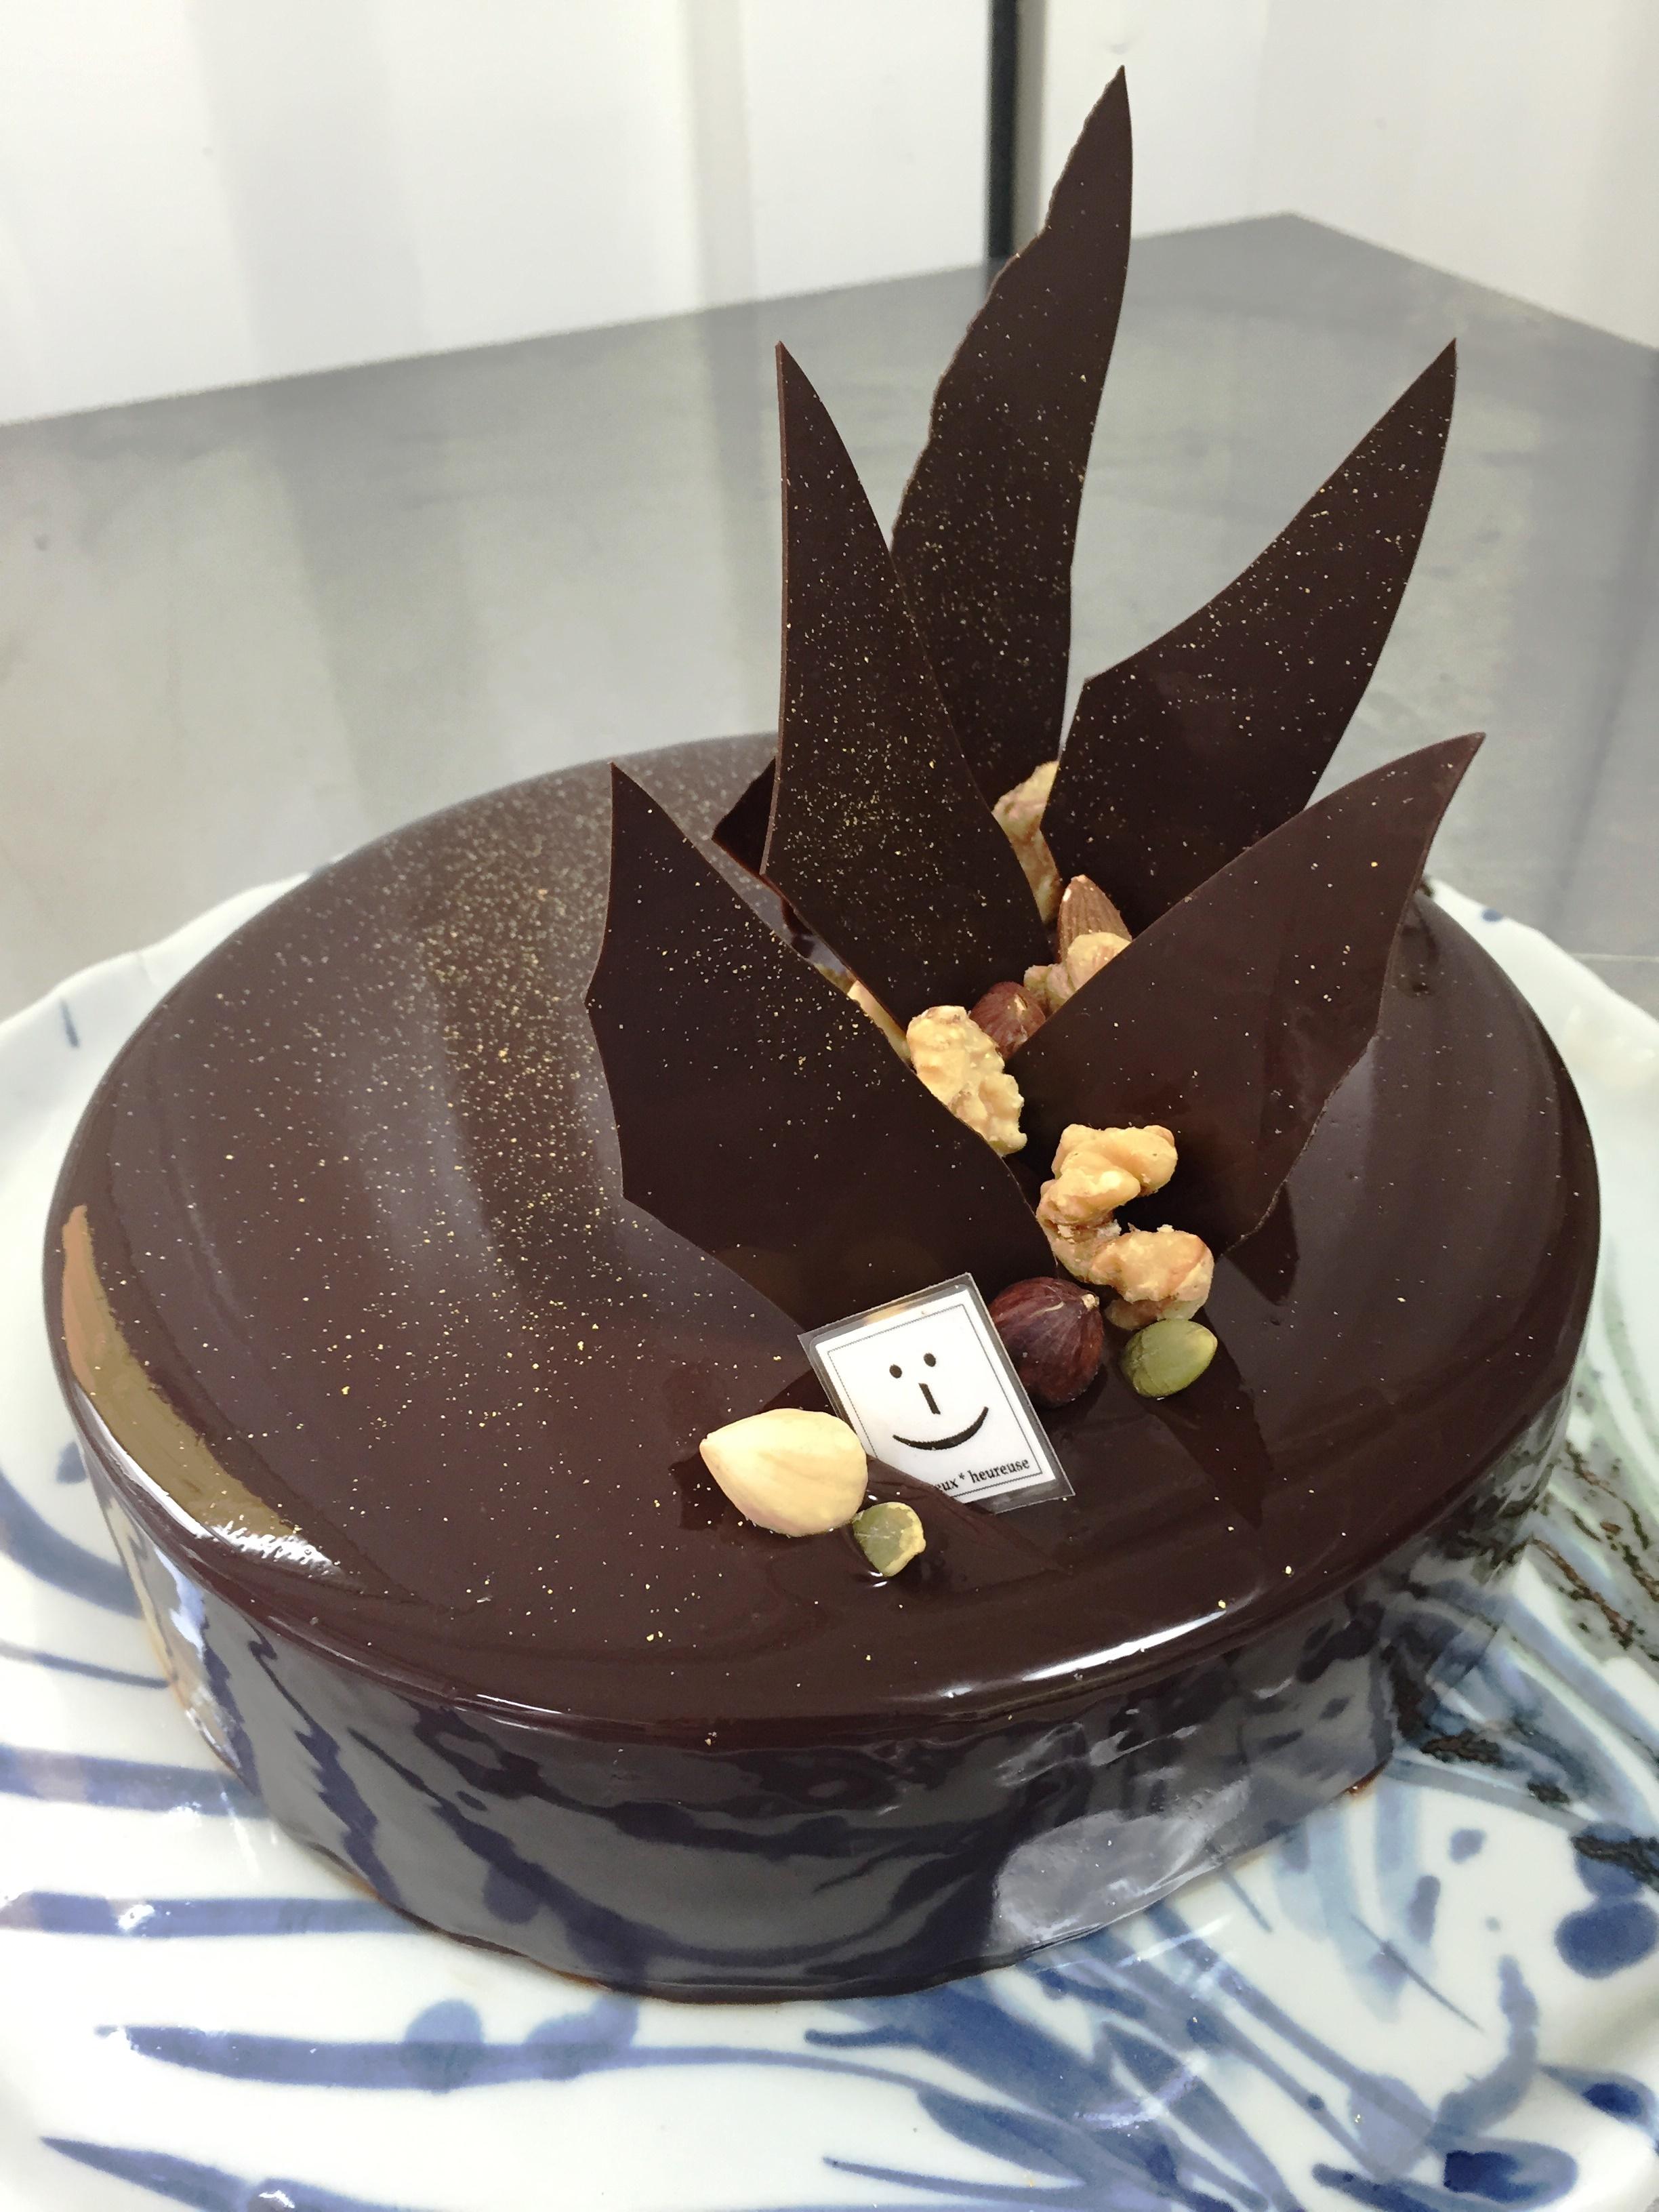 gourmandise_chocolat1.jpg